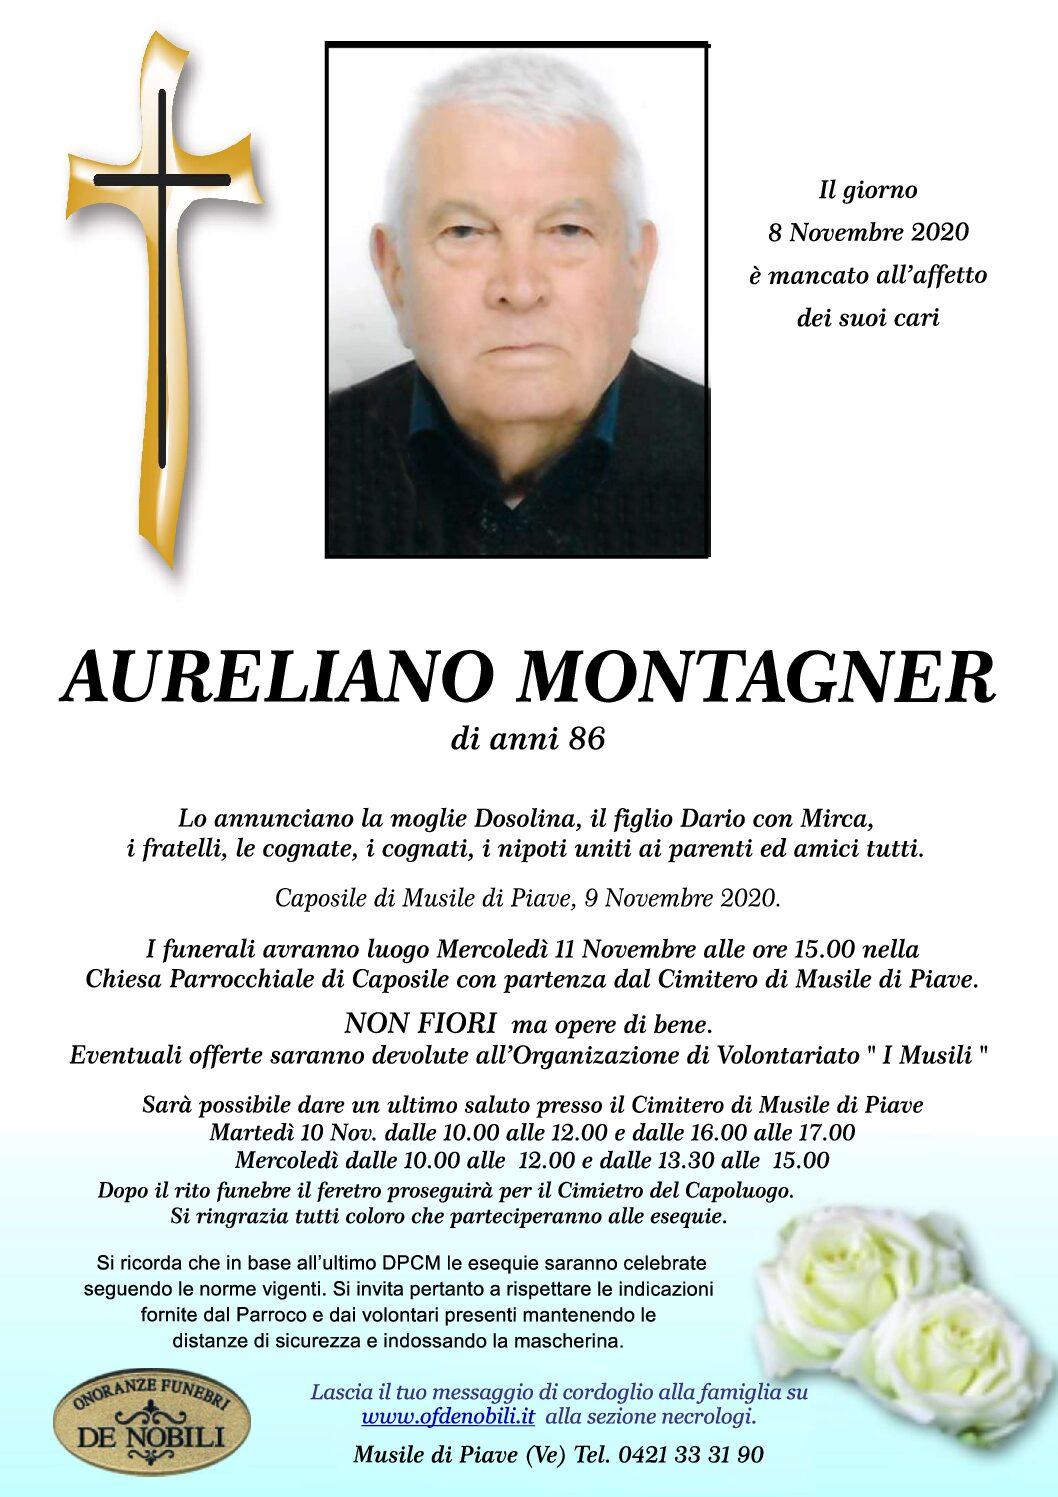 Aureliano Montagner